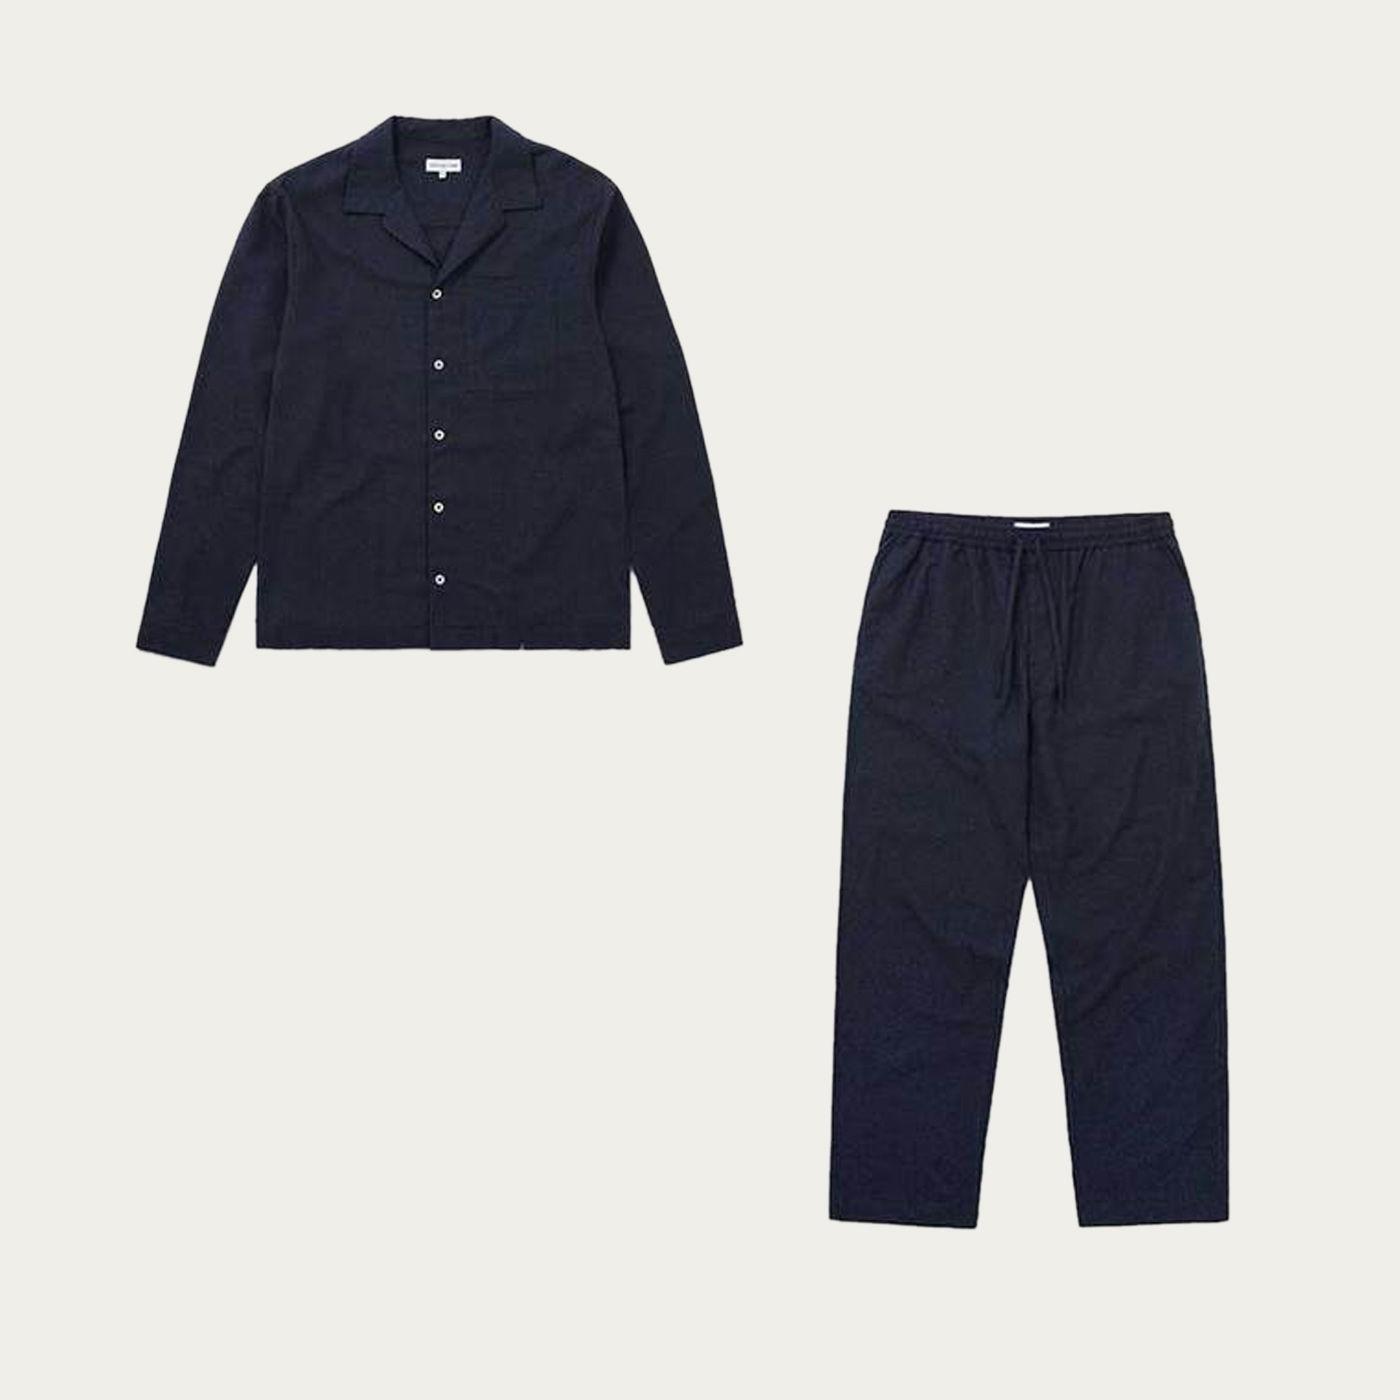 Navy Flannel Pyjama Set | Bombinate